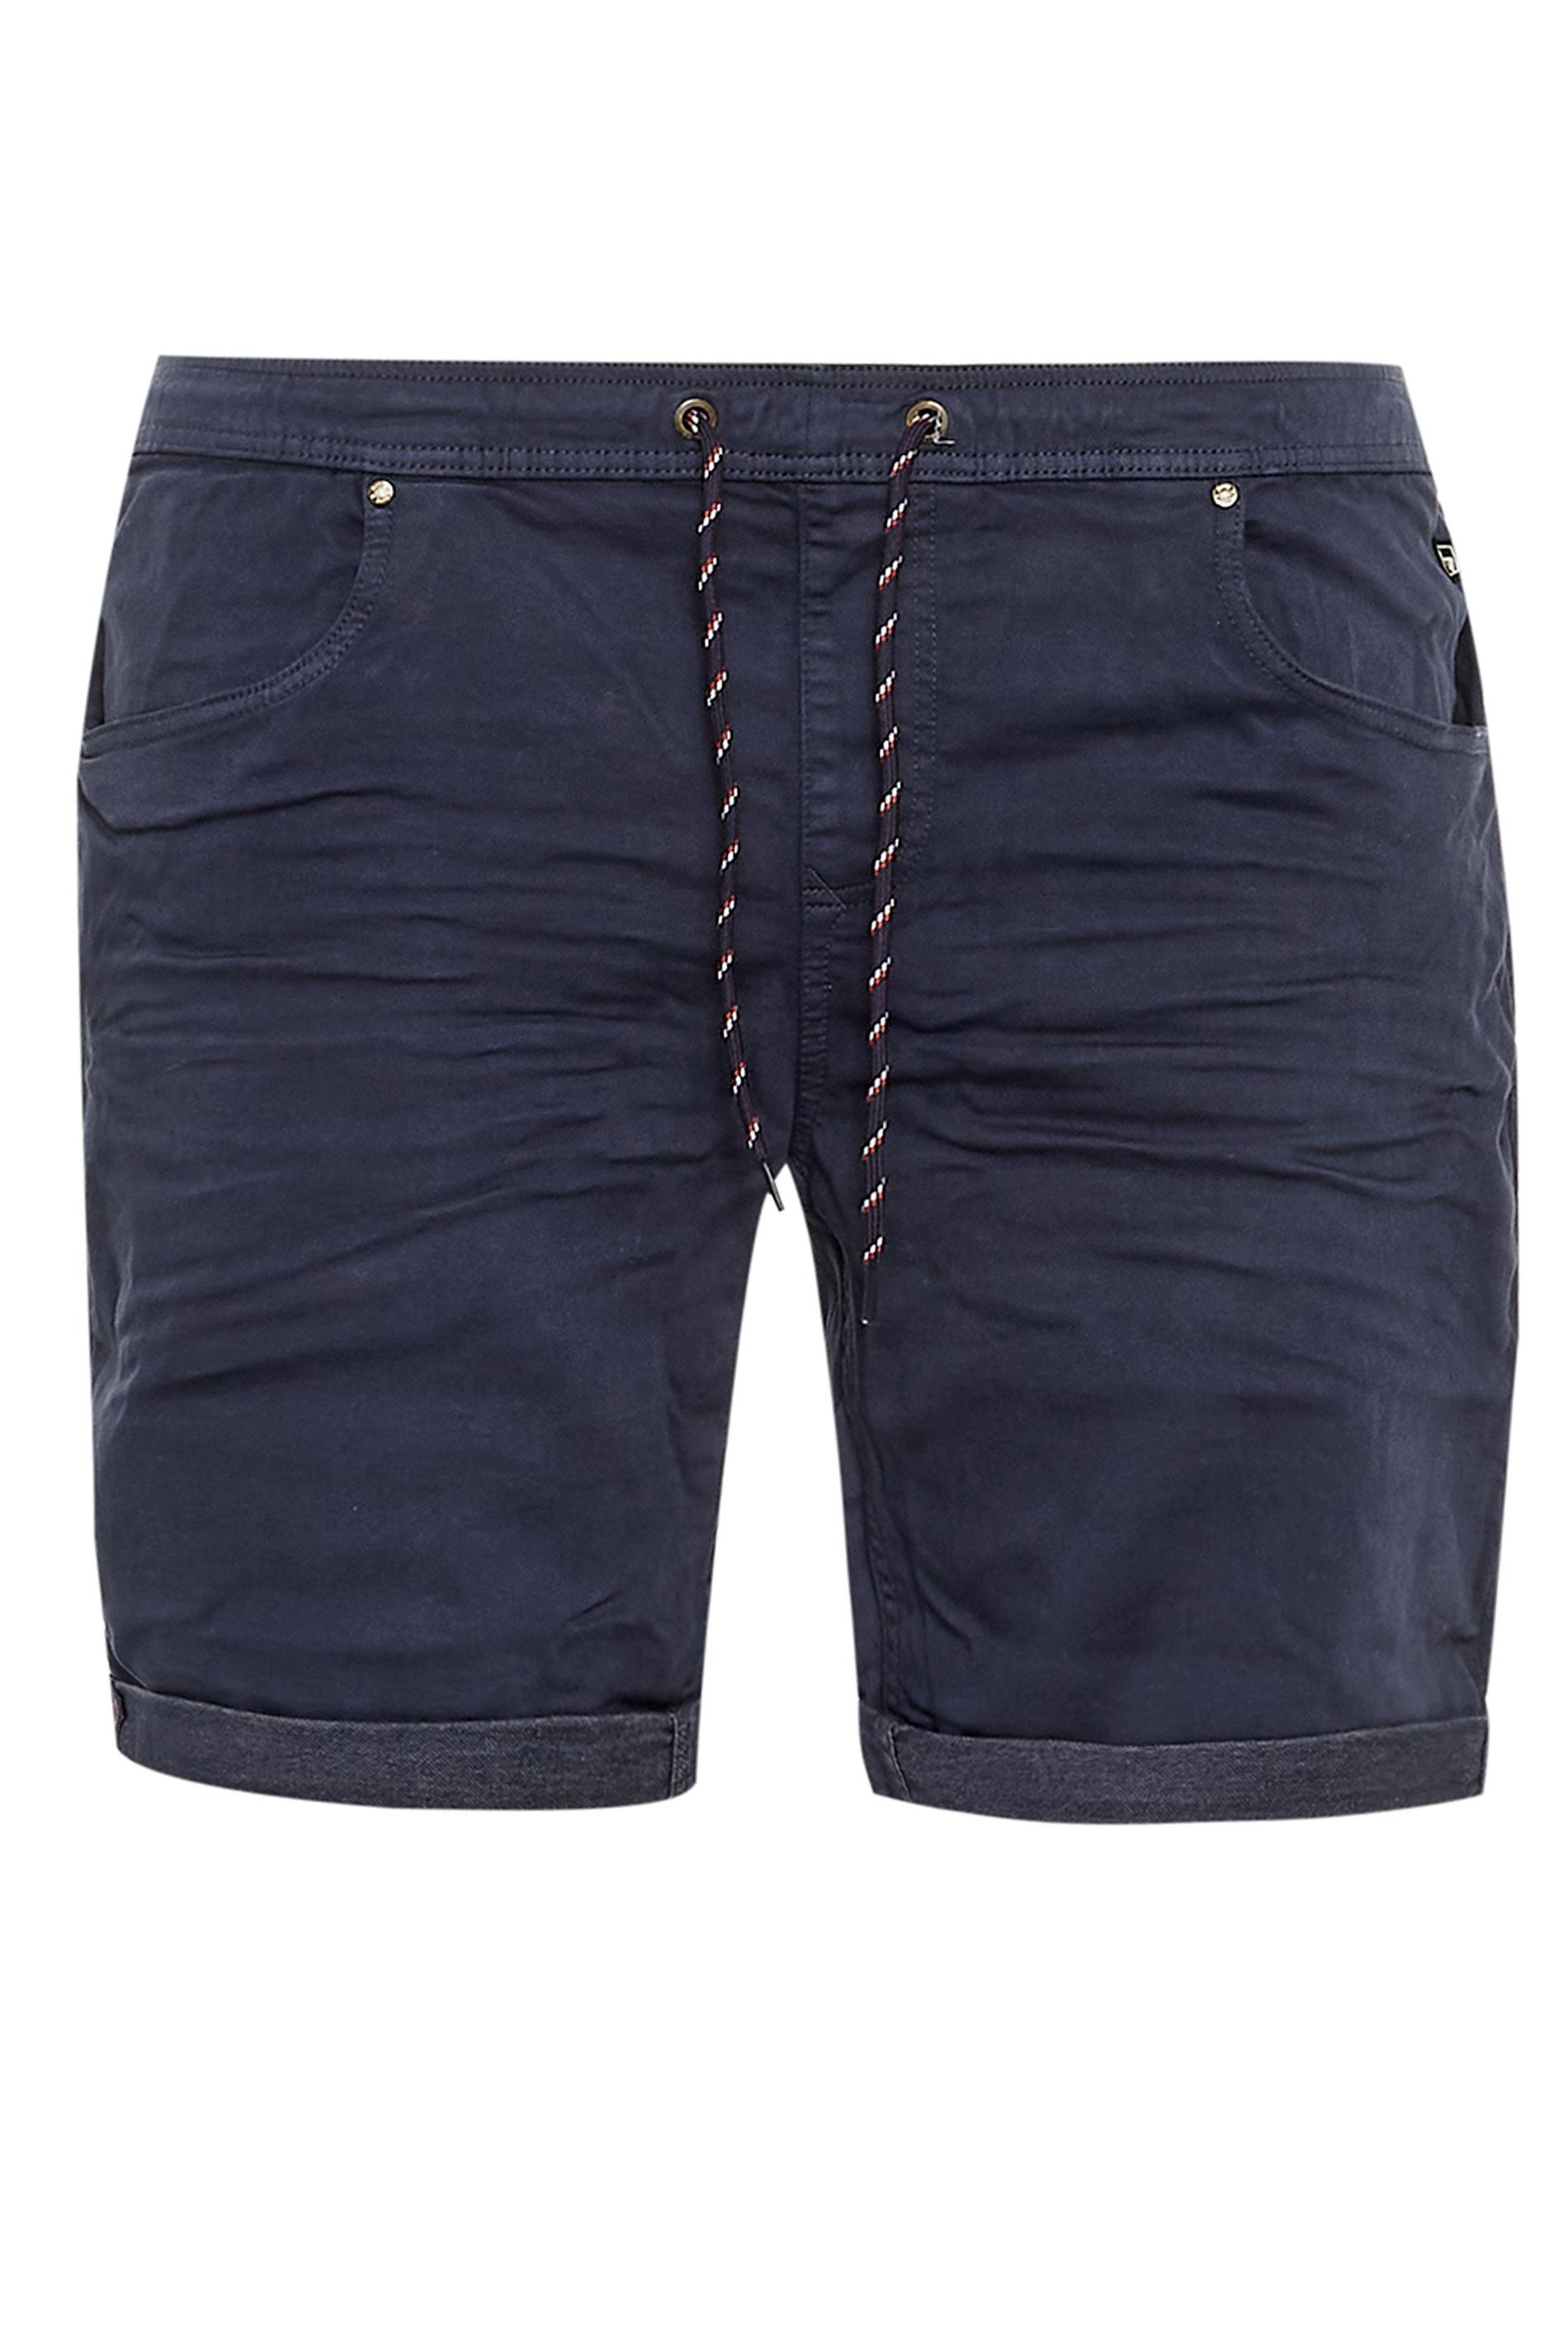 BLEND Blue Elasticated Denim Shorts